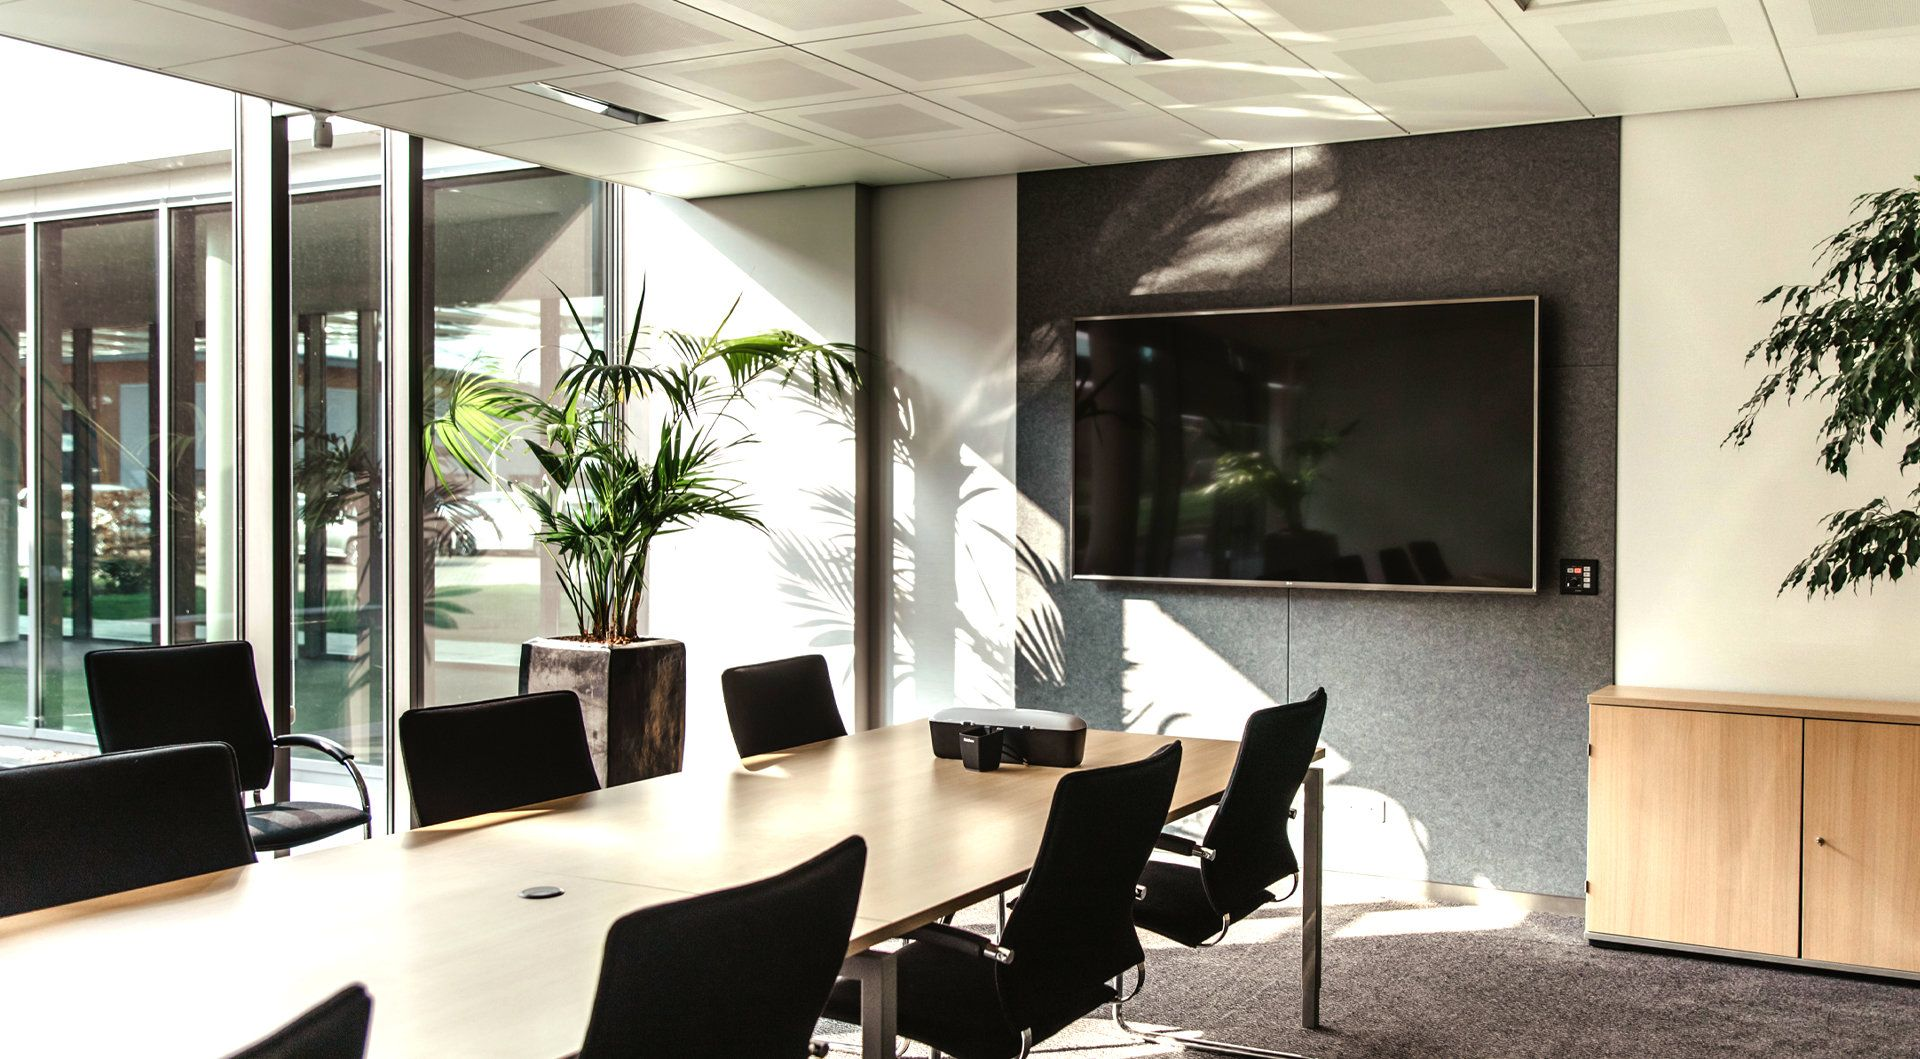 "Projecta Tensioned Elpro Concept projectiescherm 3,1 m (122"") 16:9 - Case studie de vries"